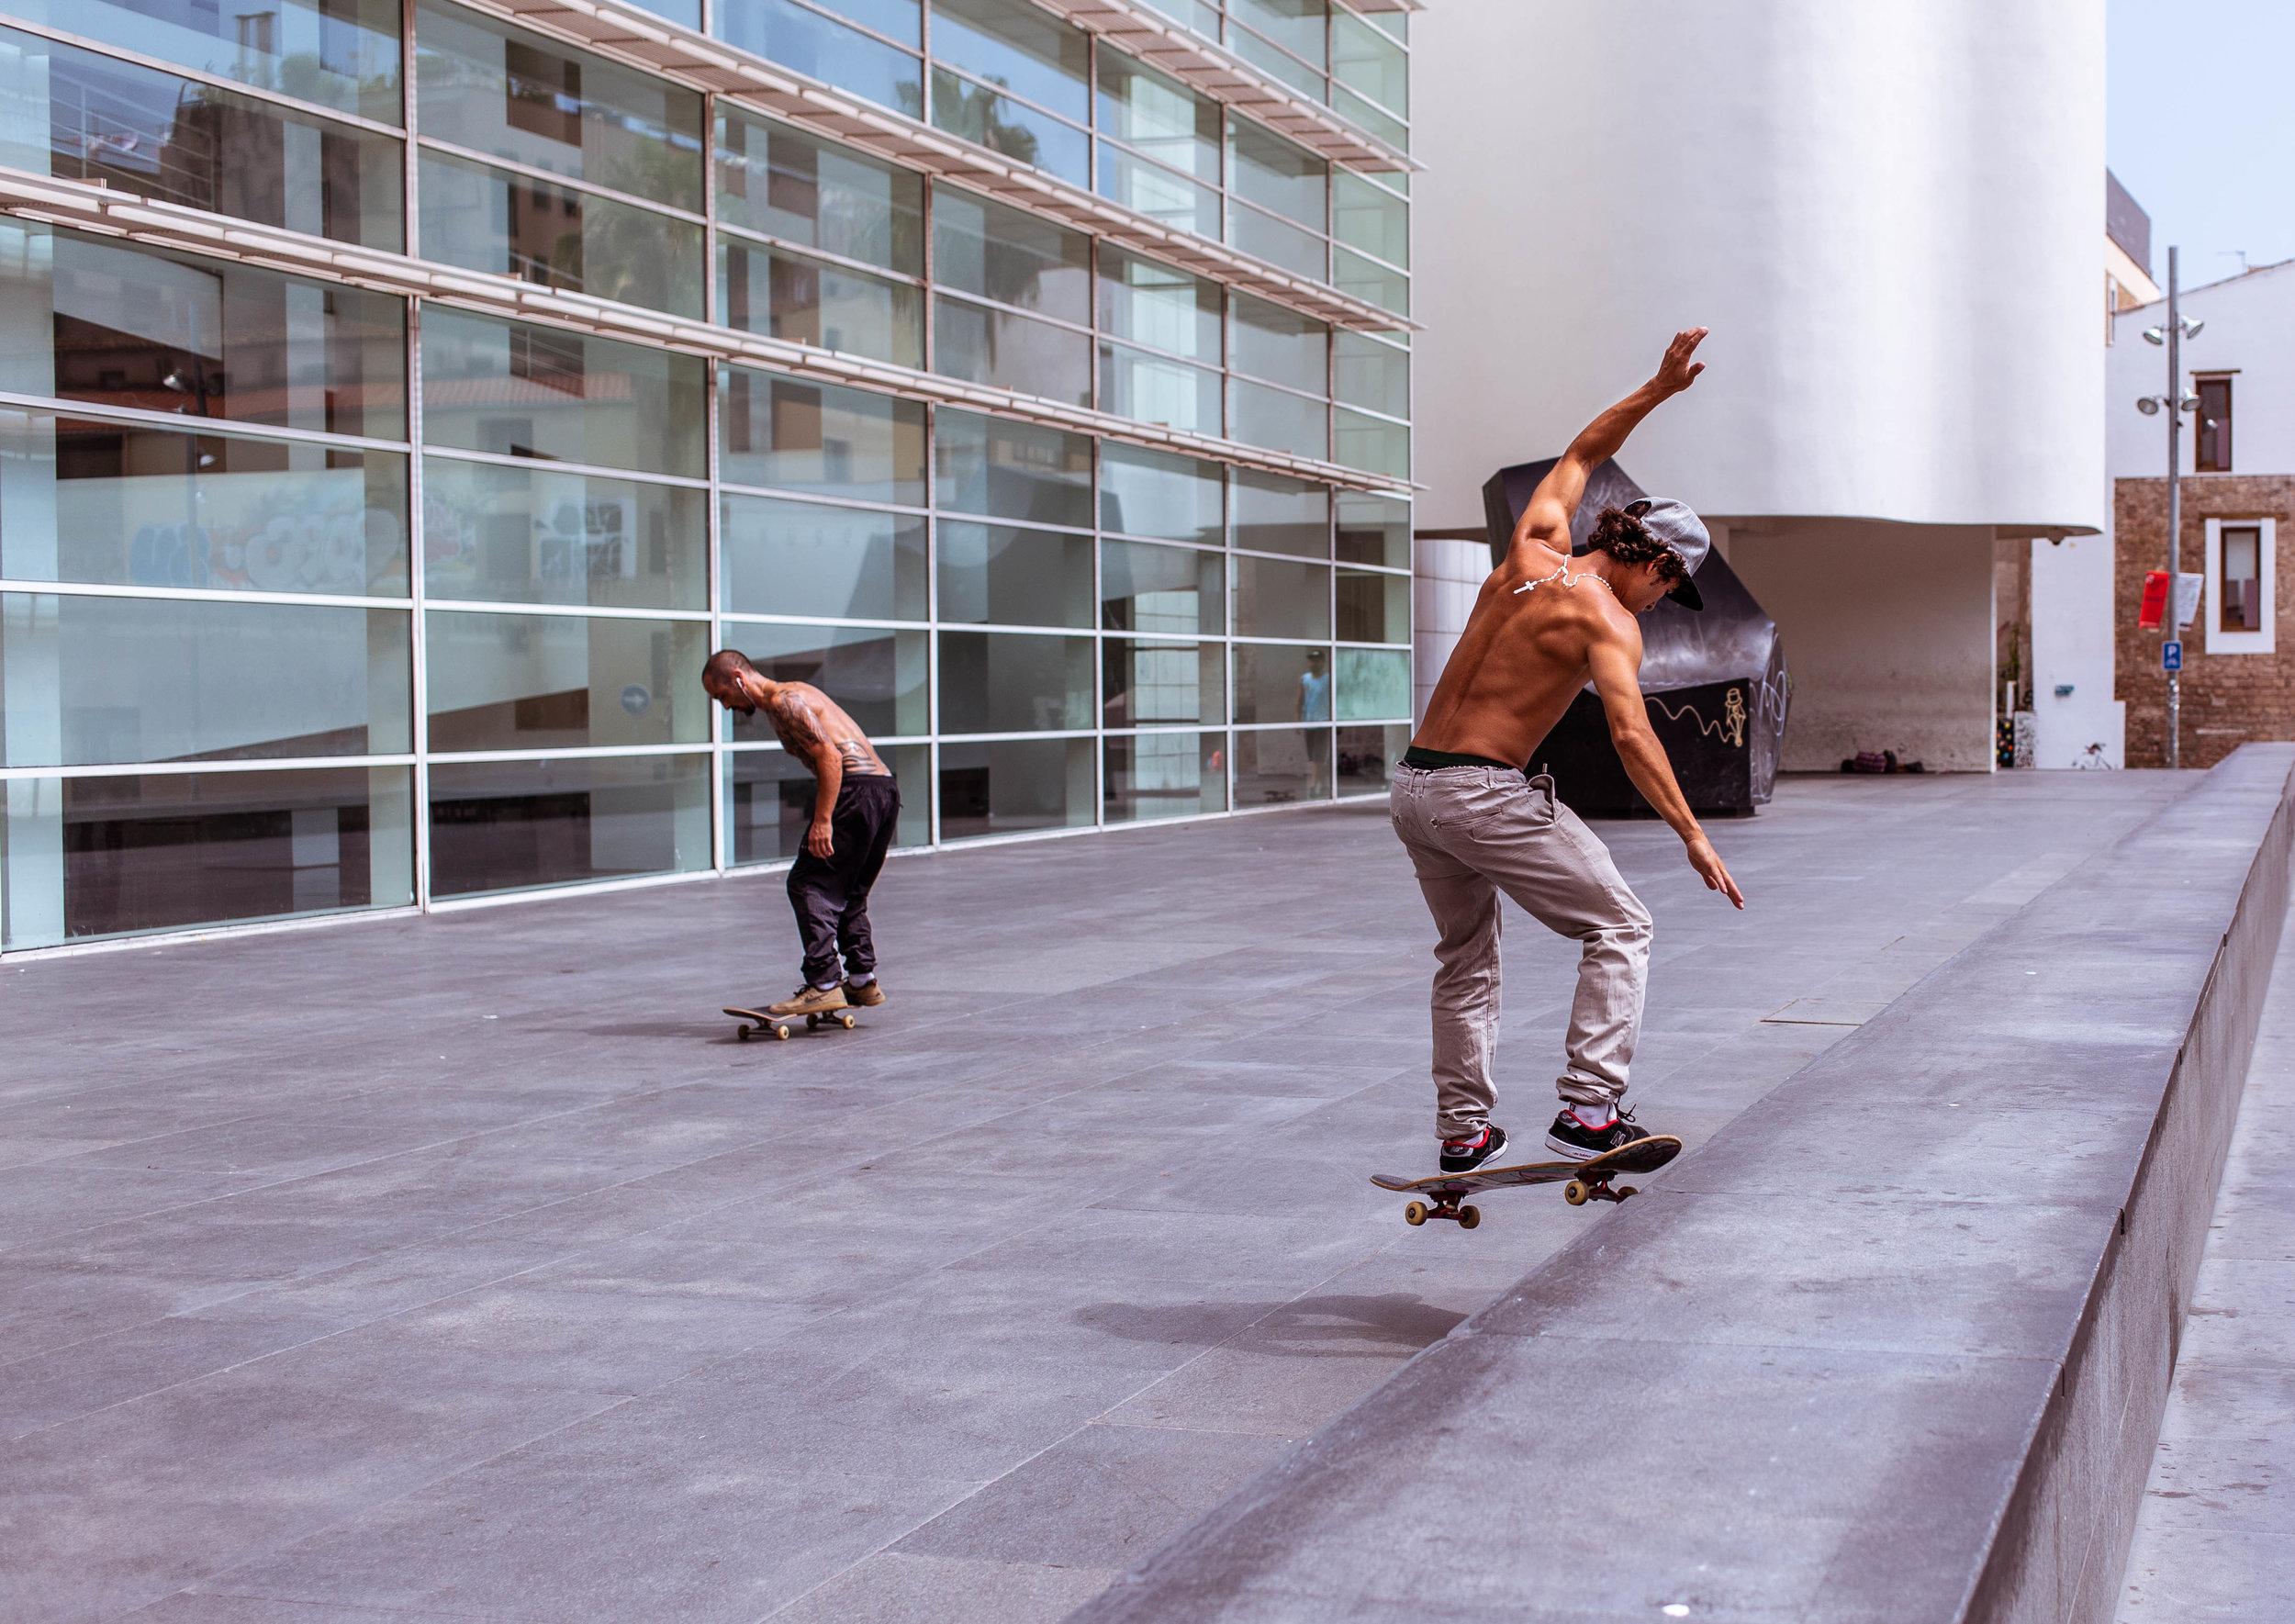 skateboarders (1 of 1).jpg